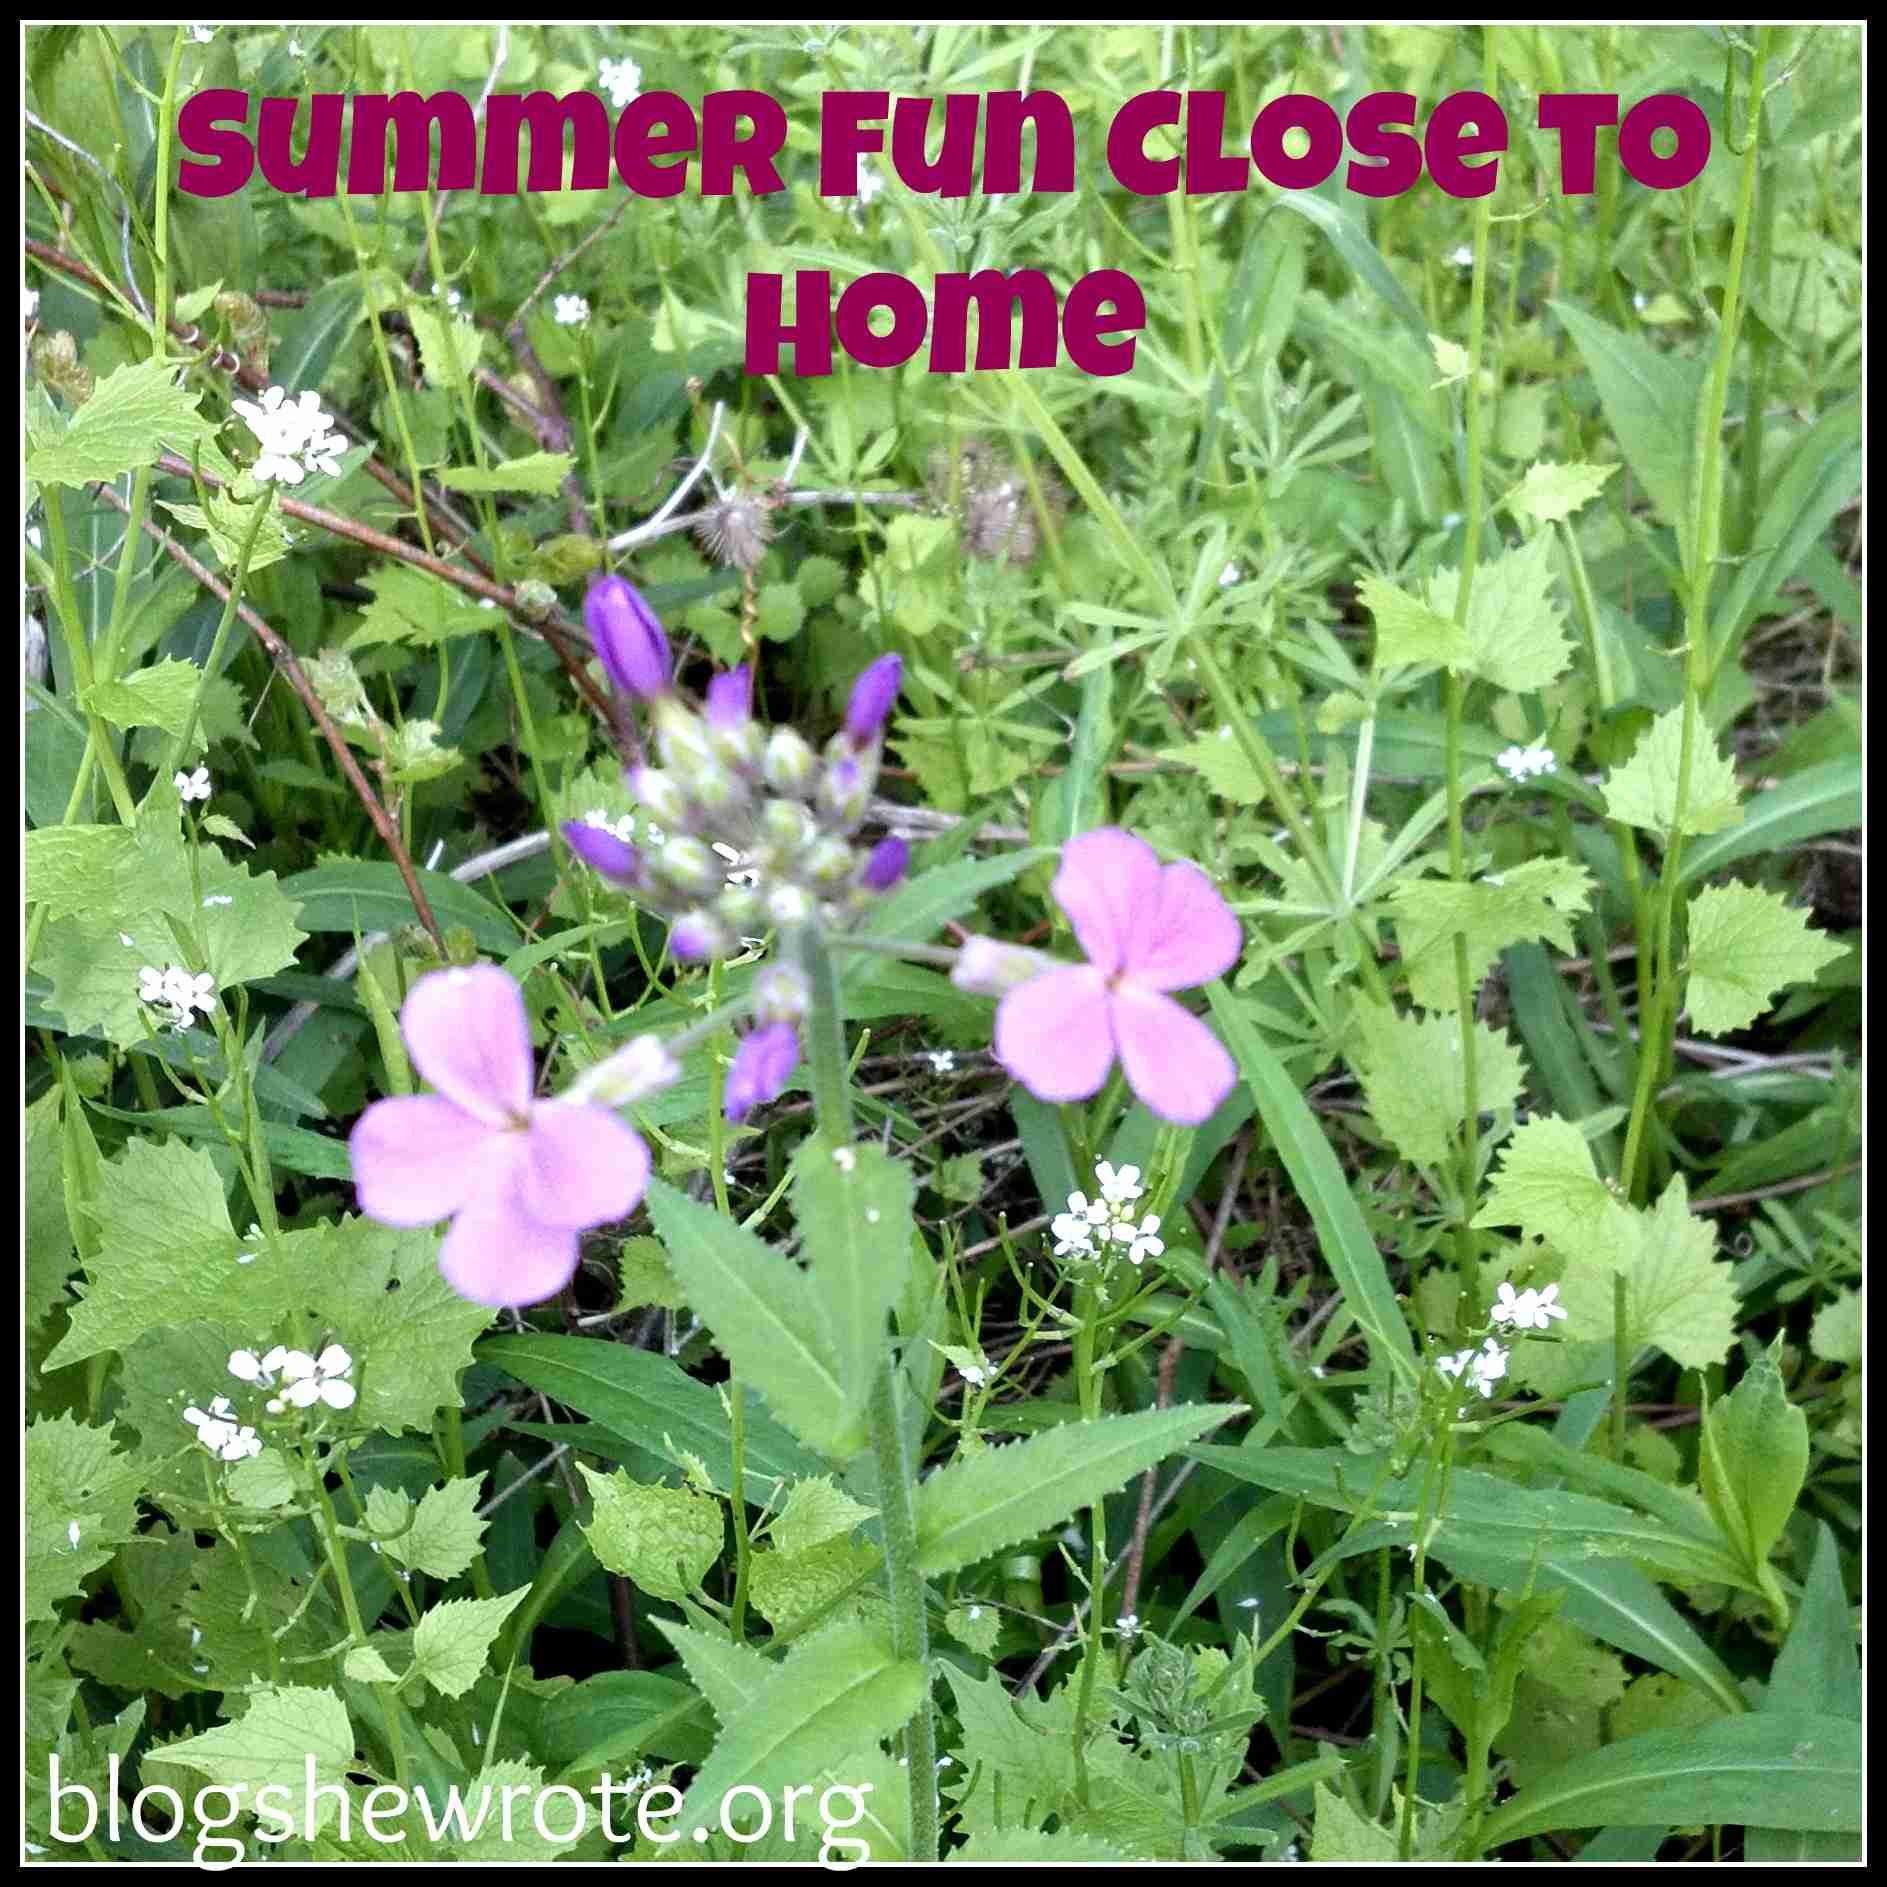 Blog, She Wrote: Summer Fun Close to Home